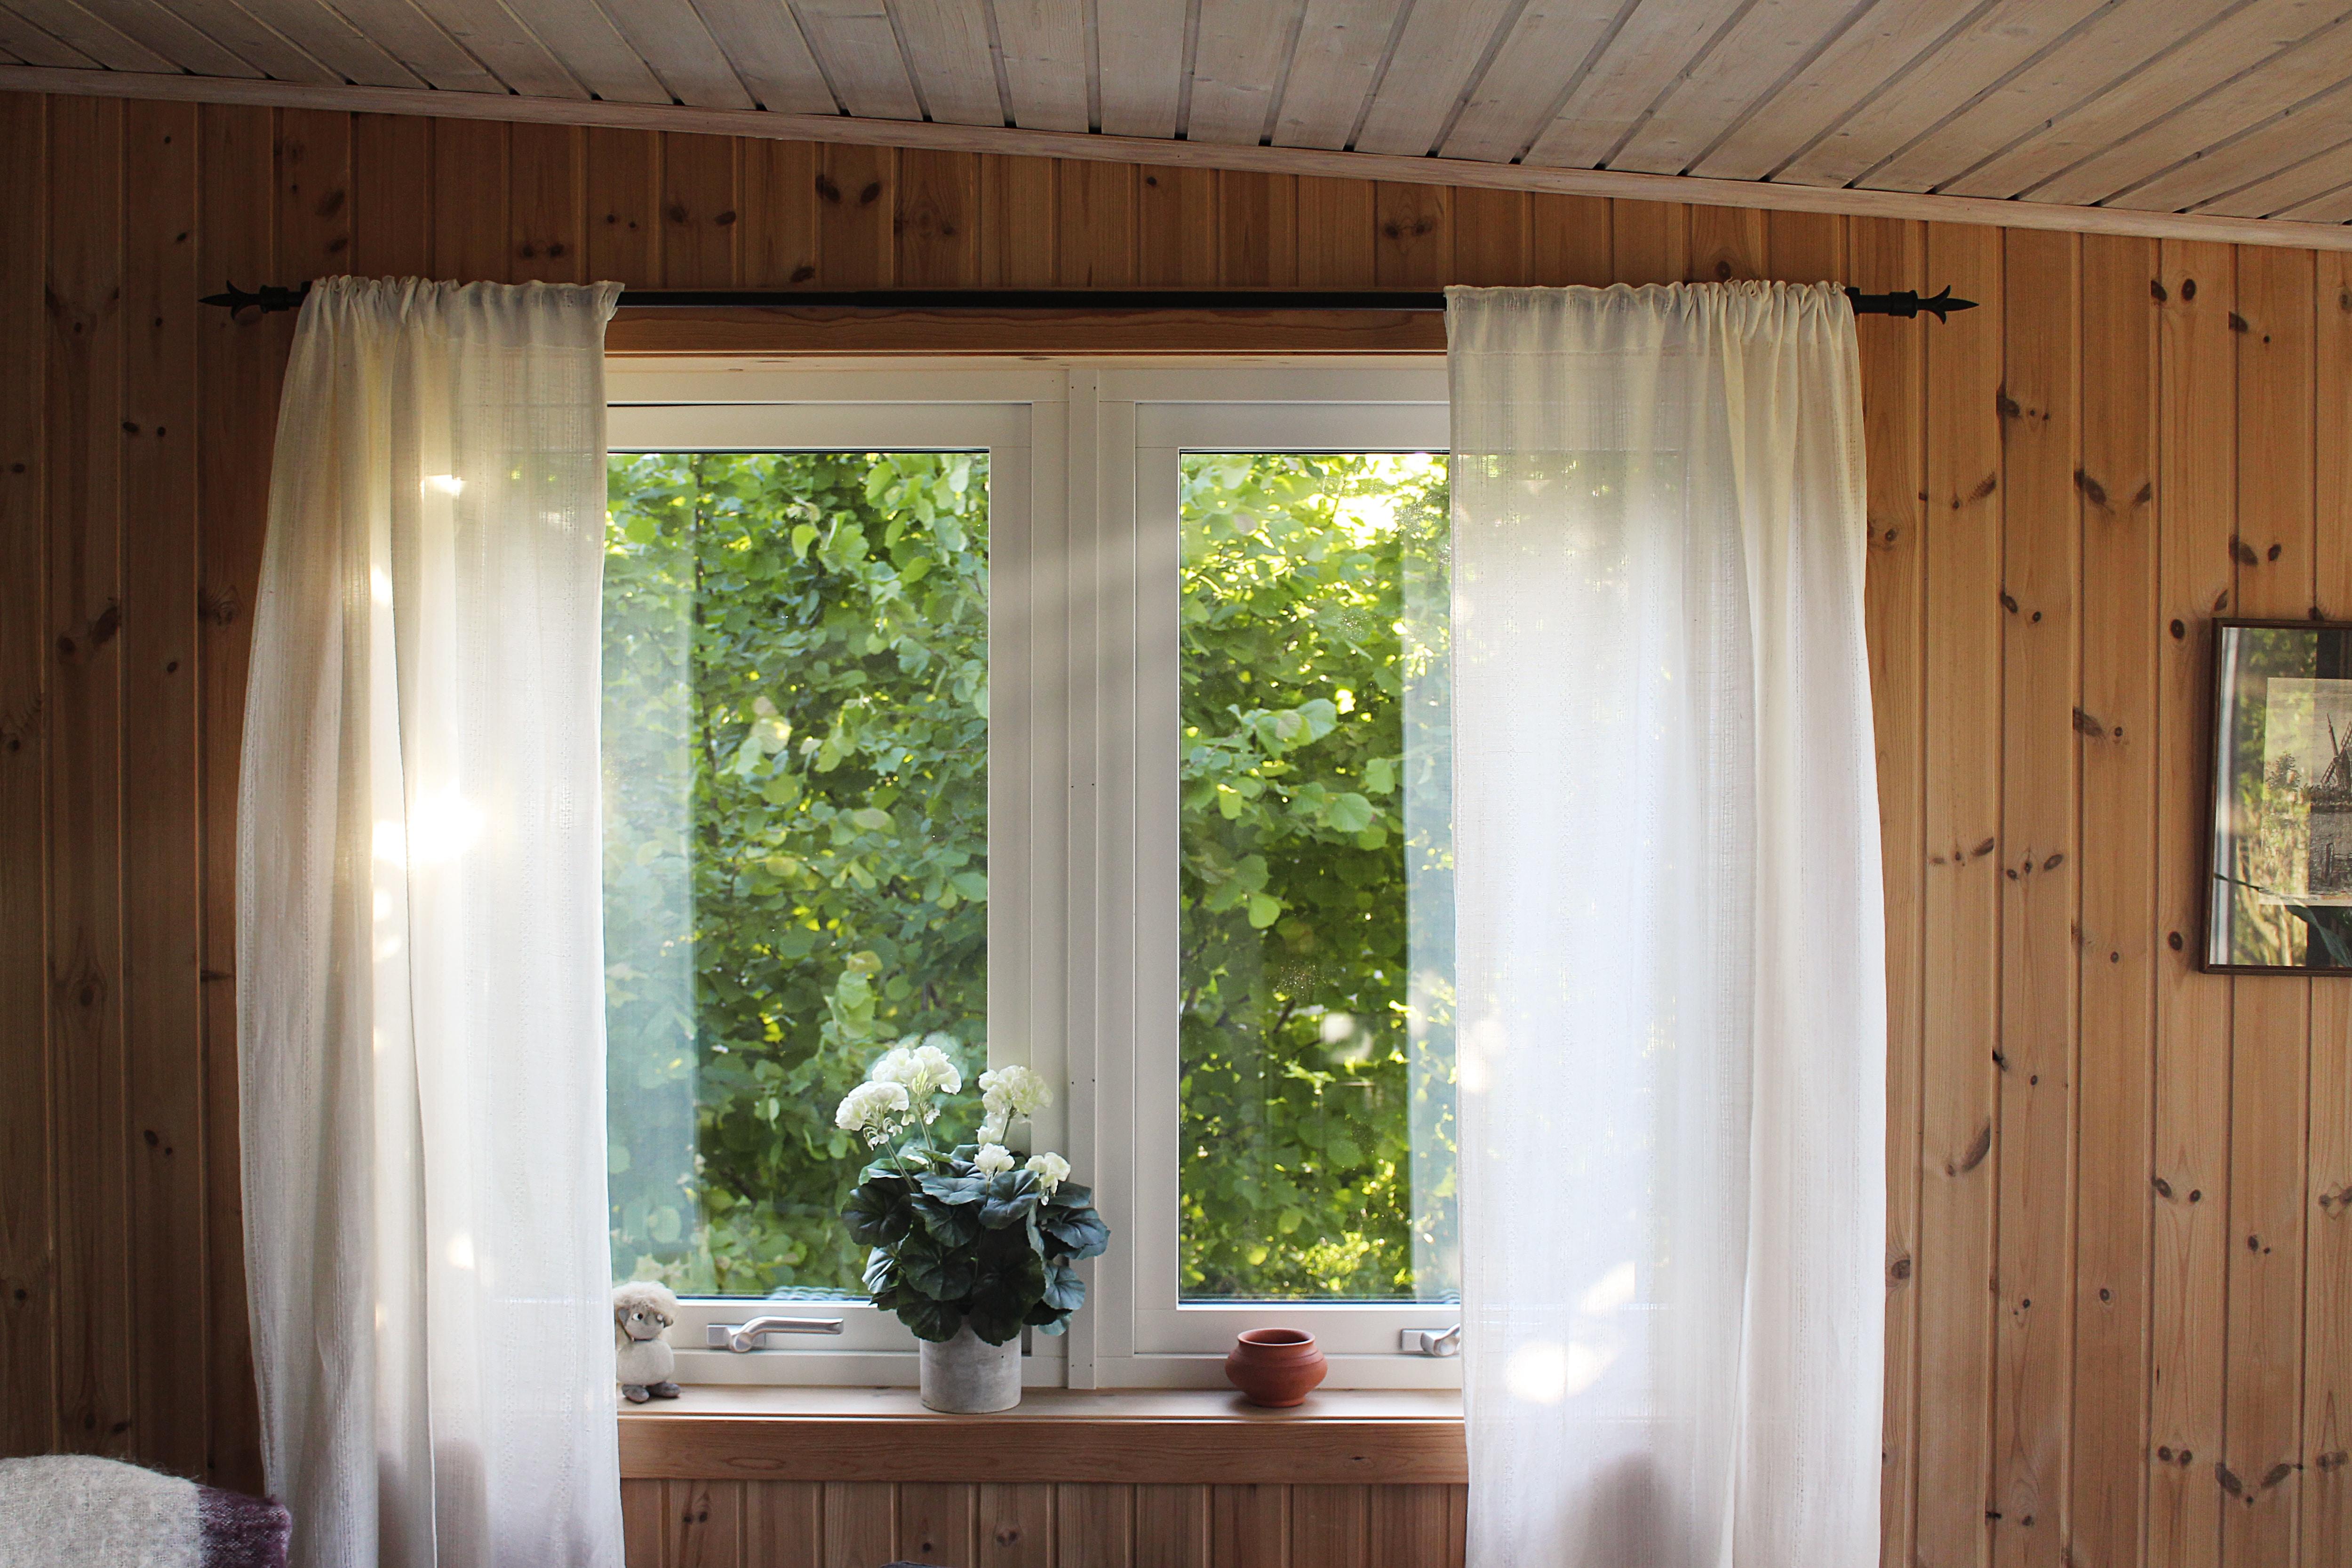 finestre riscaldamento efficienza.jpg